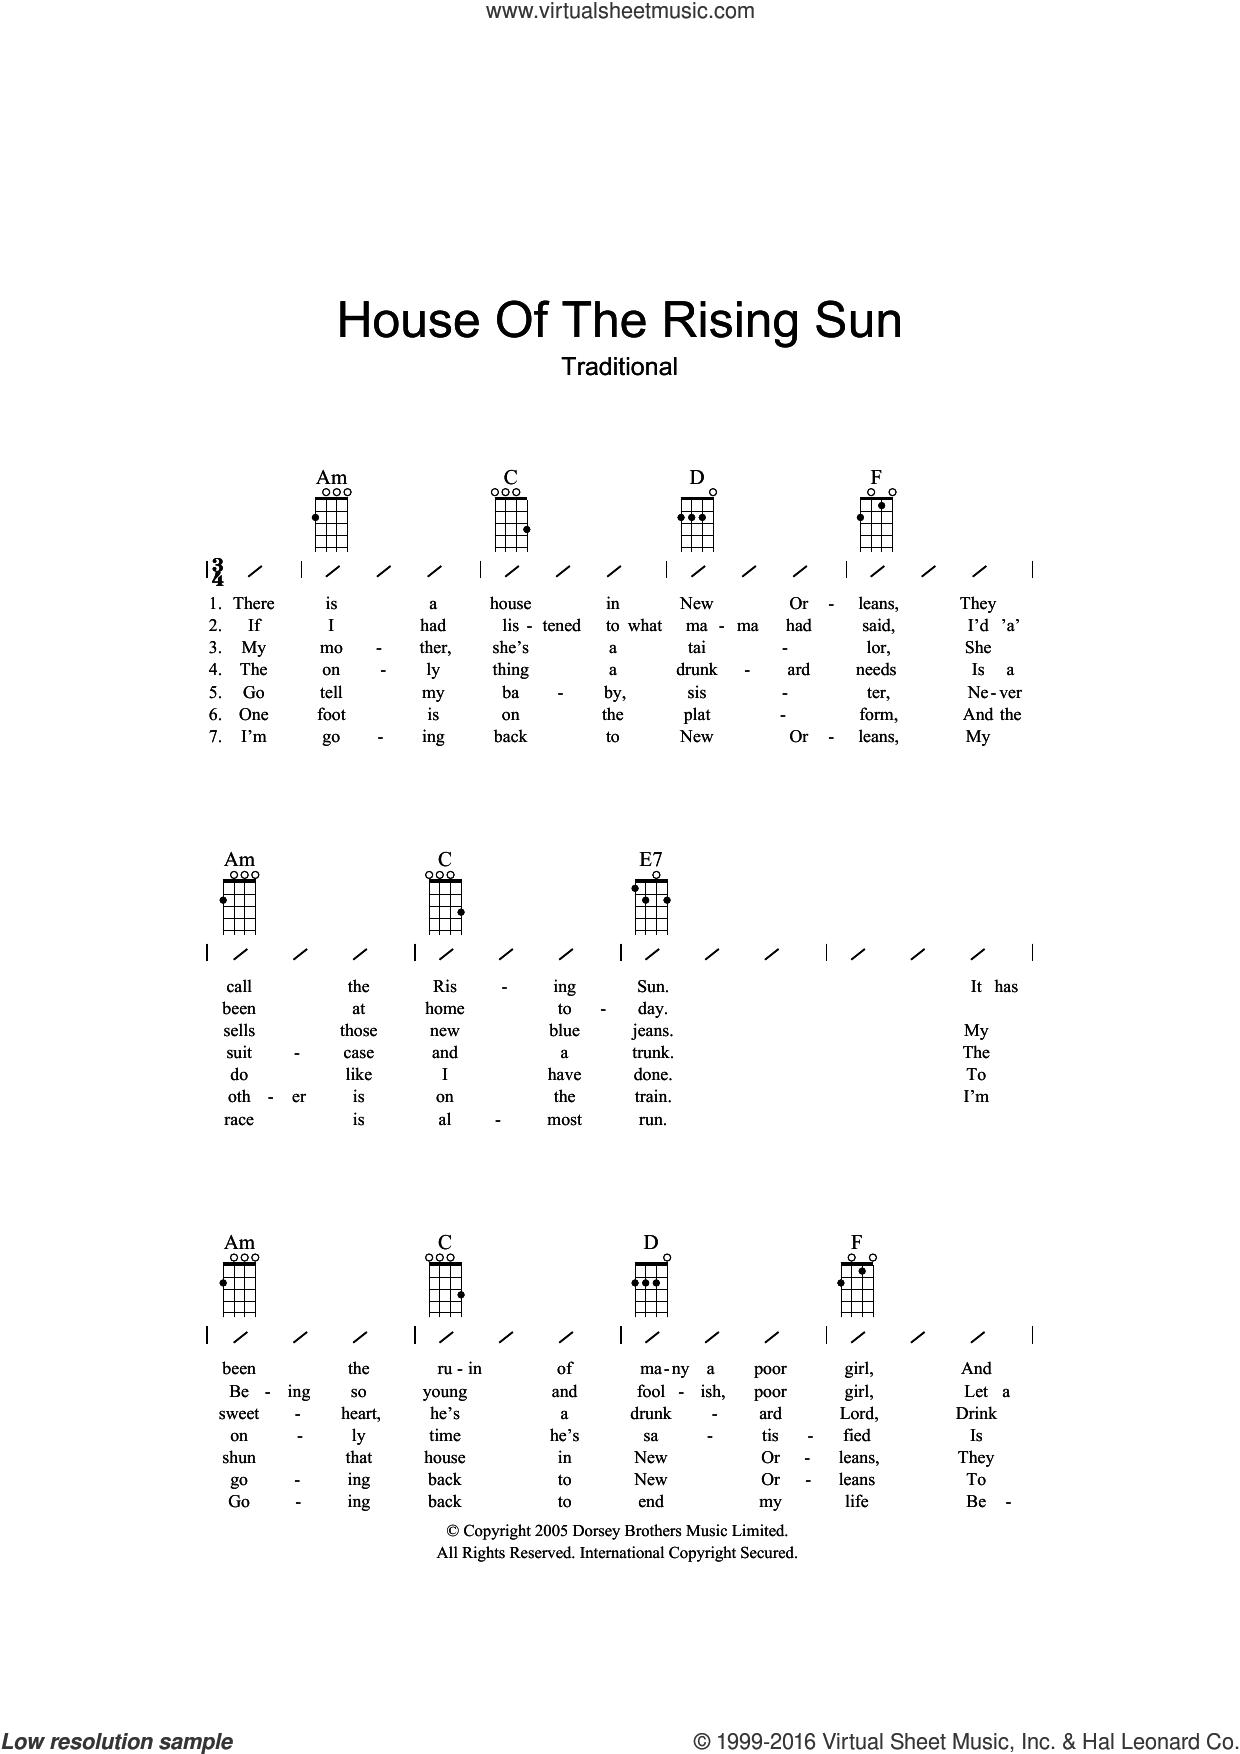 House Of The Rising Sun sheet music for ukulele (chords), intermediate skill level